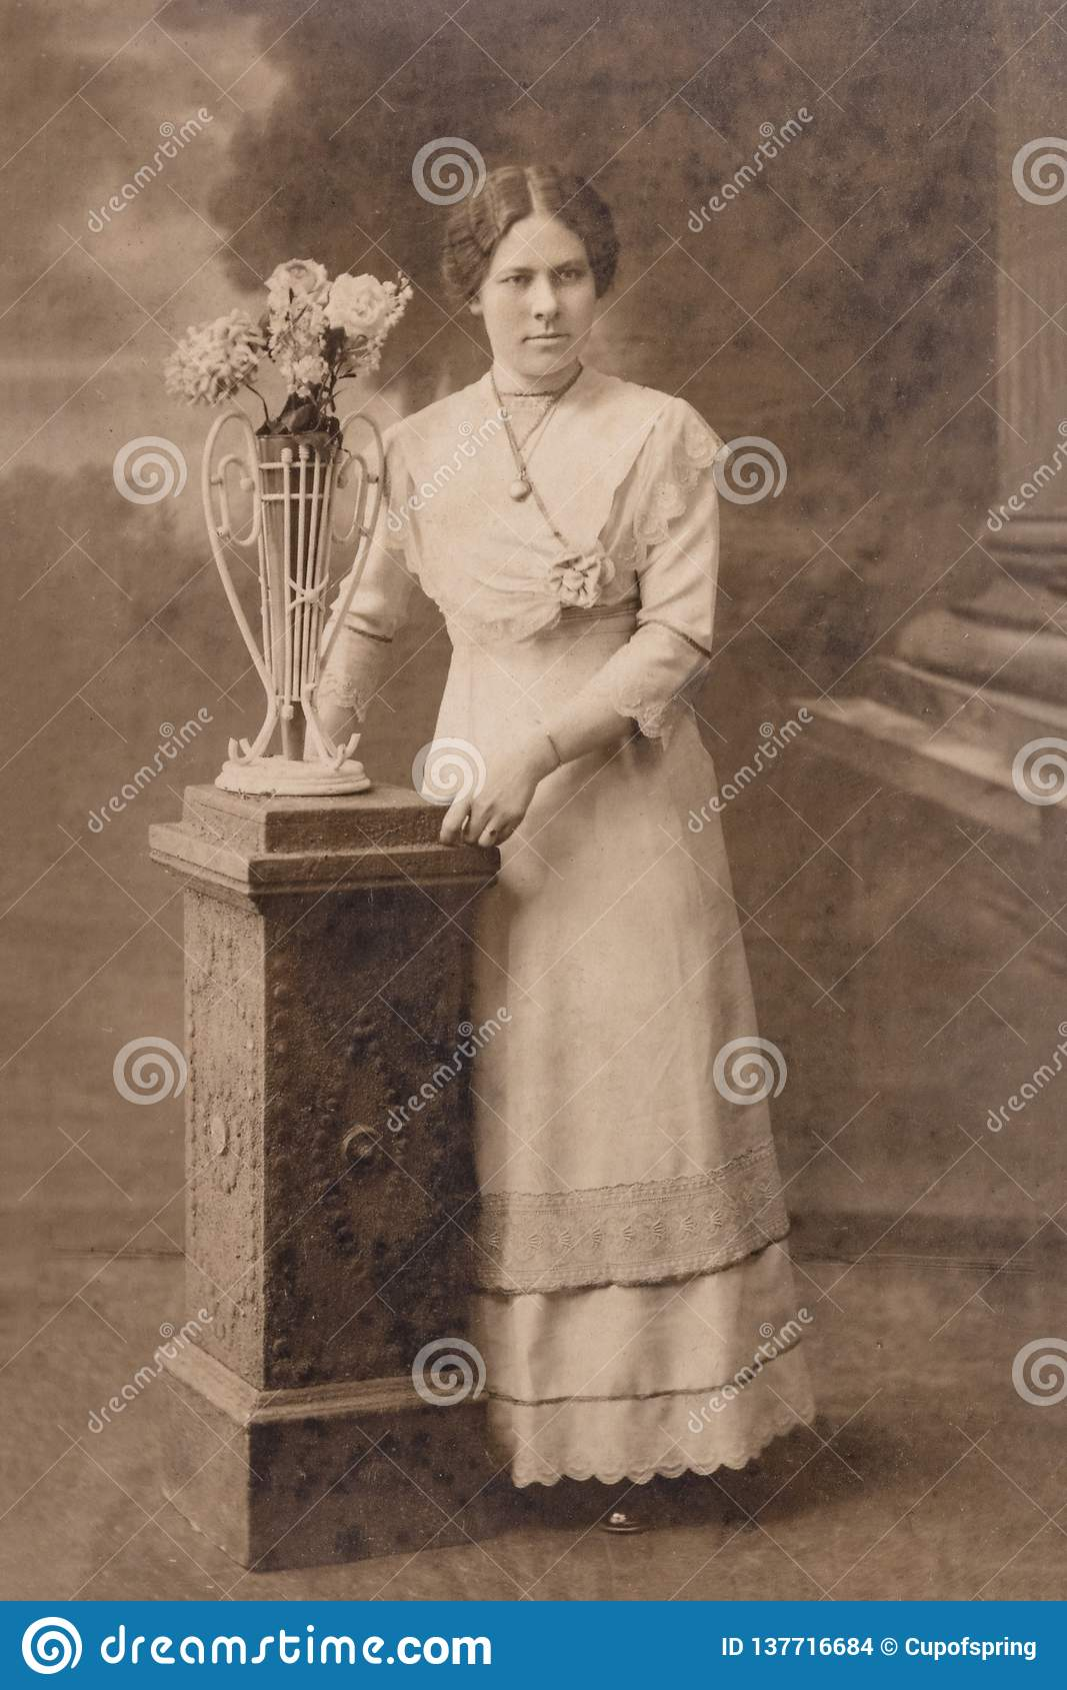 RUSSIA - CIRCA 1905-1910: A portrait of young woman in studio, Vintage Carte de Viste Edwardian era photo